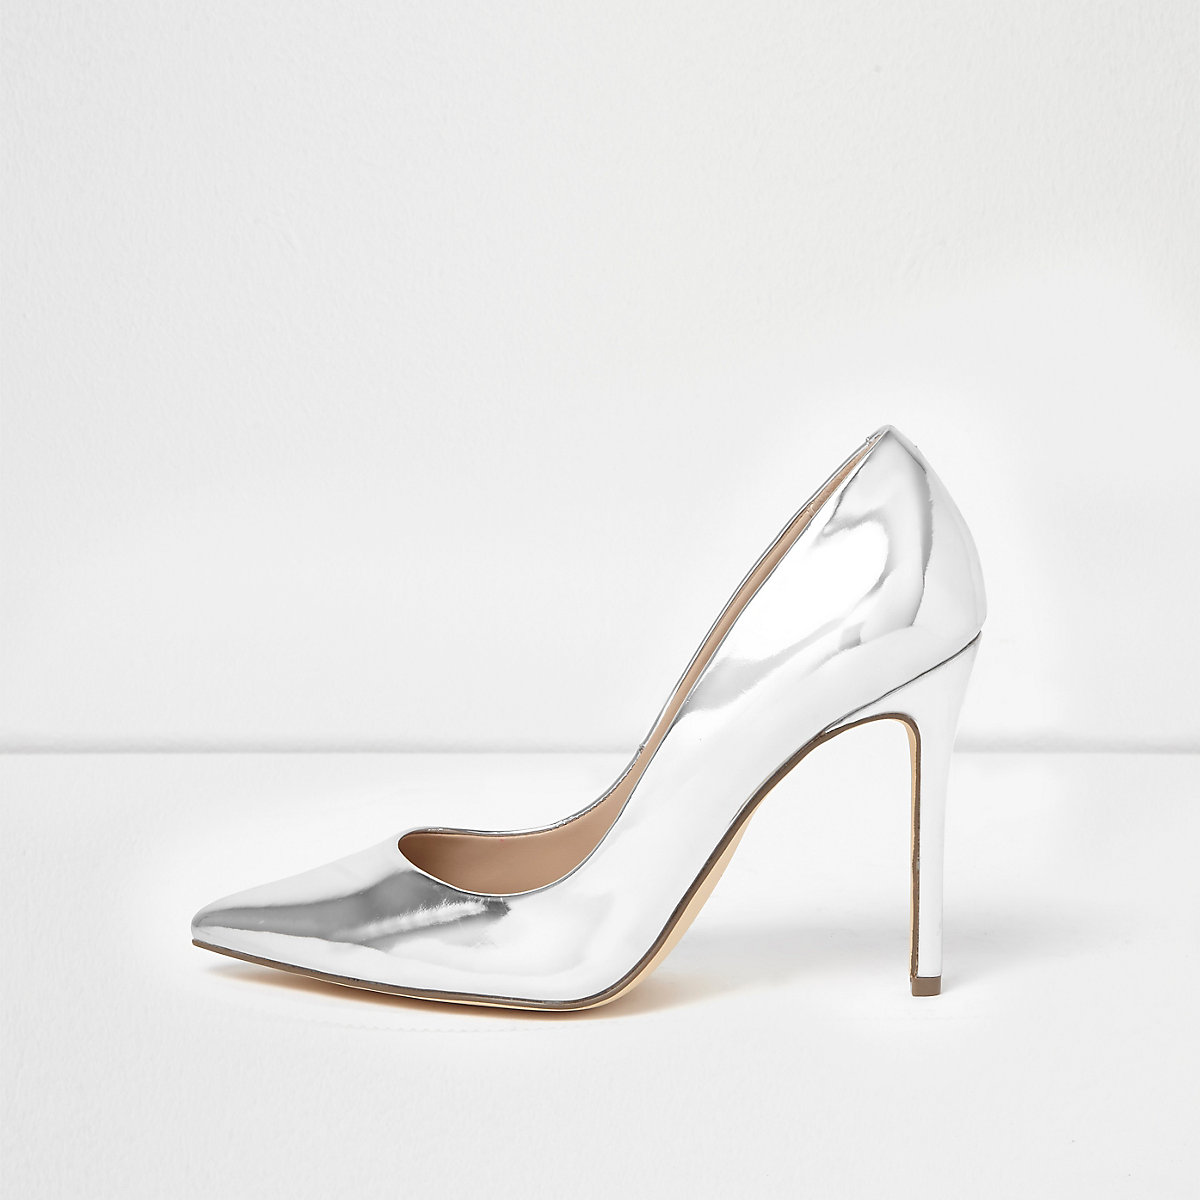 fd9ed88ddc30 Silver patent court shoes - Wedding Guest Dresses   Outfits - Sale ...